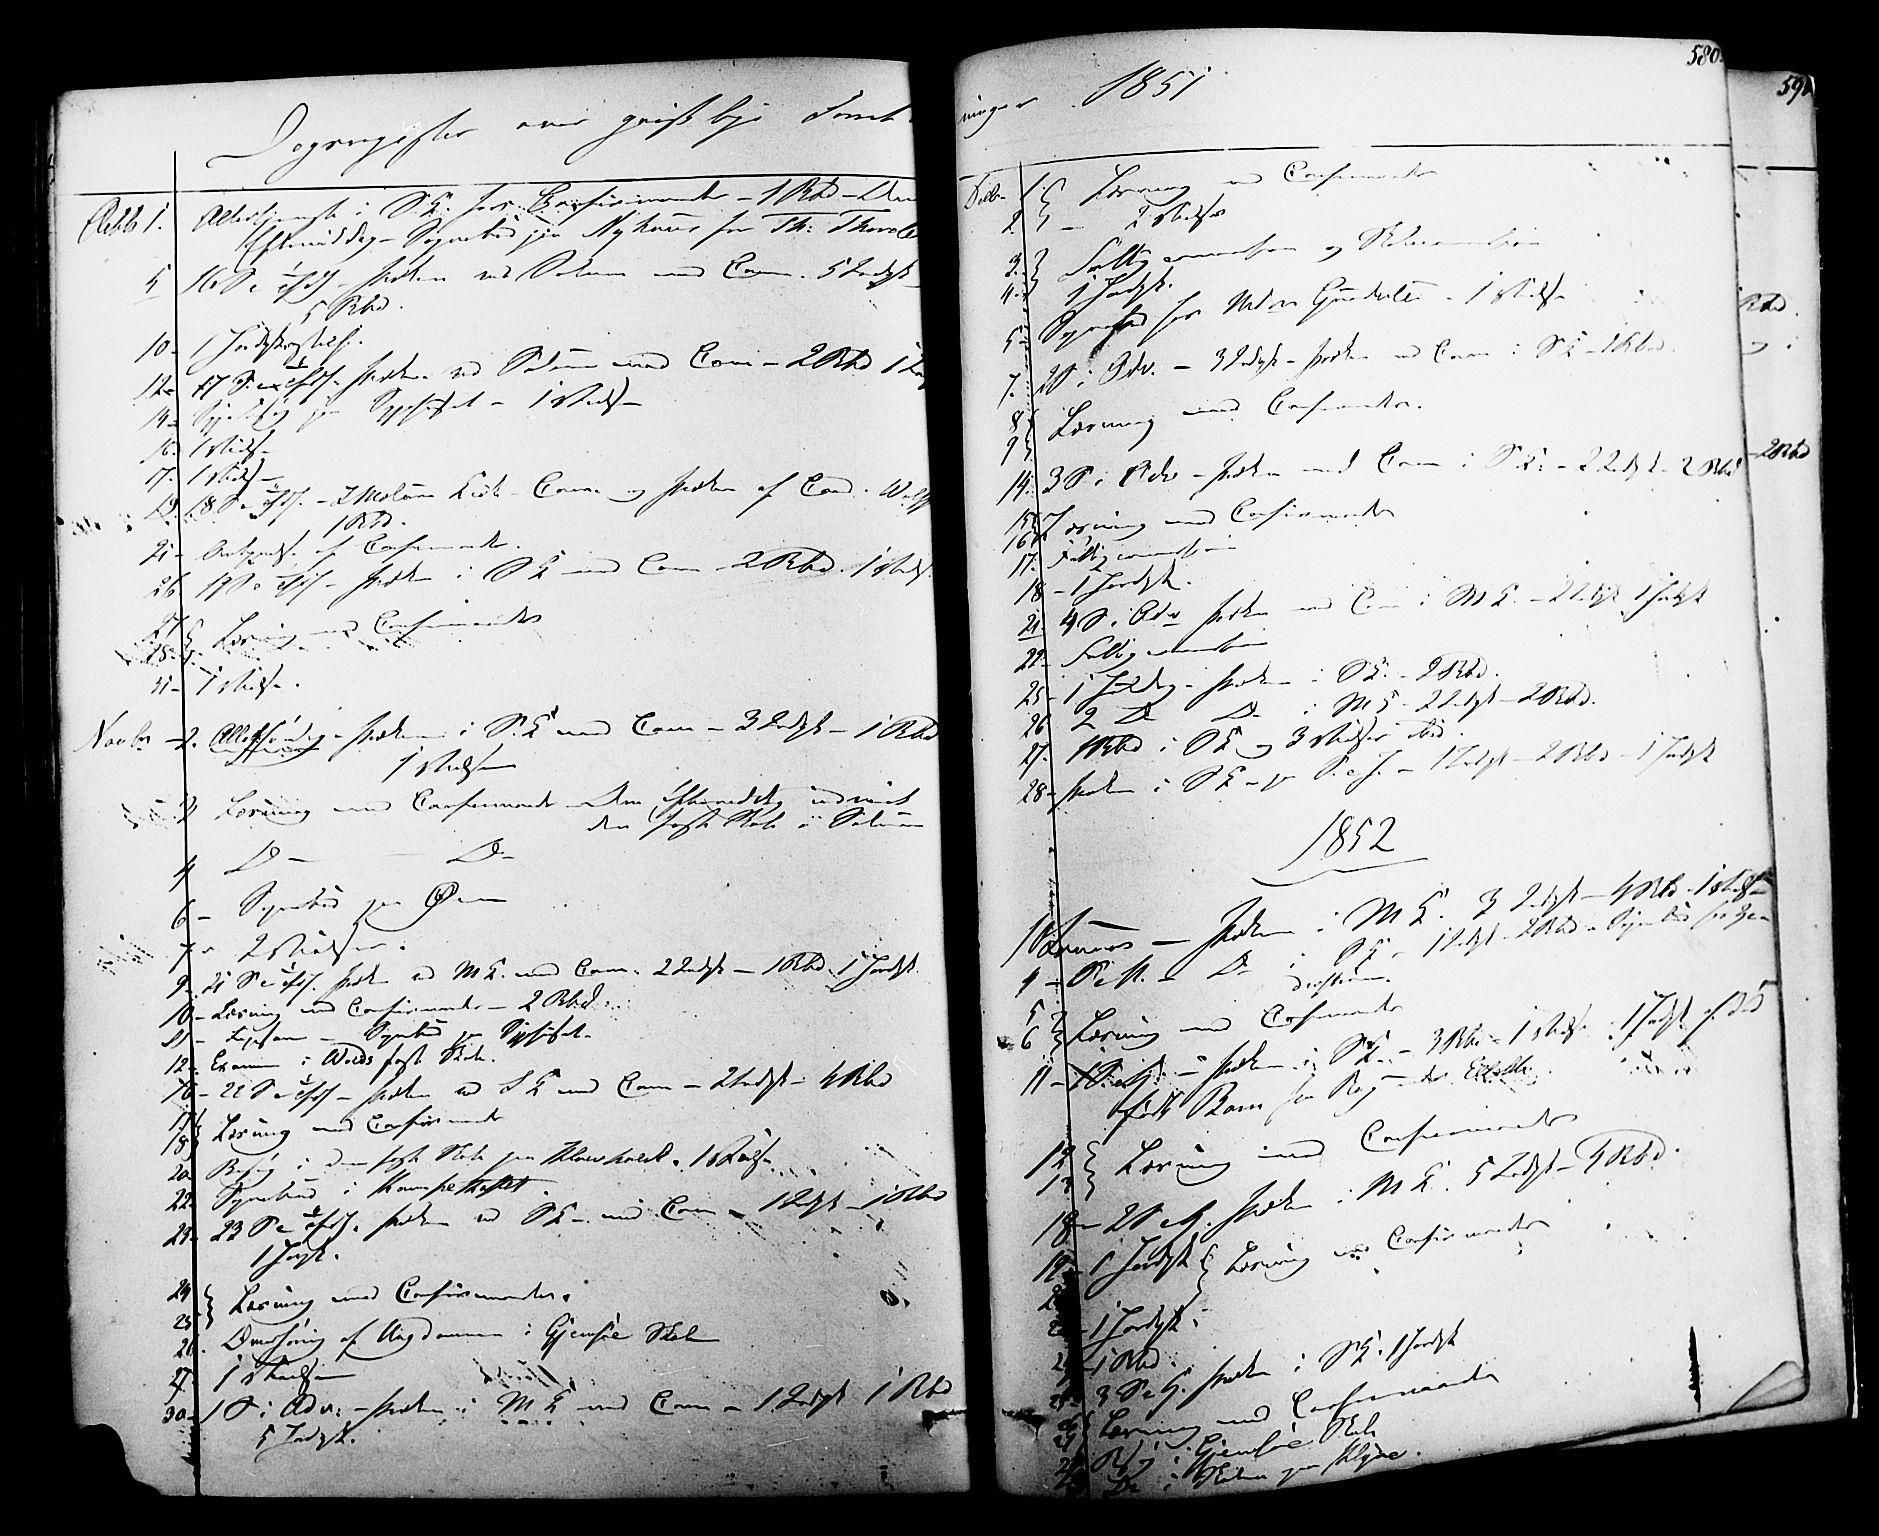 SAKO, Solum kirkebøker, F/Fa/L0006: Ministerialbok nr. I 6, 1844-1855, s. 580